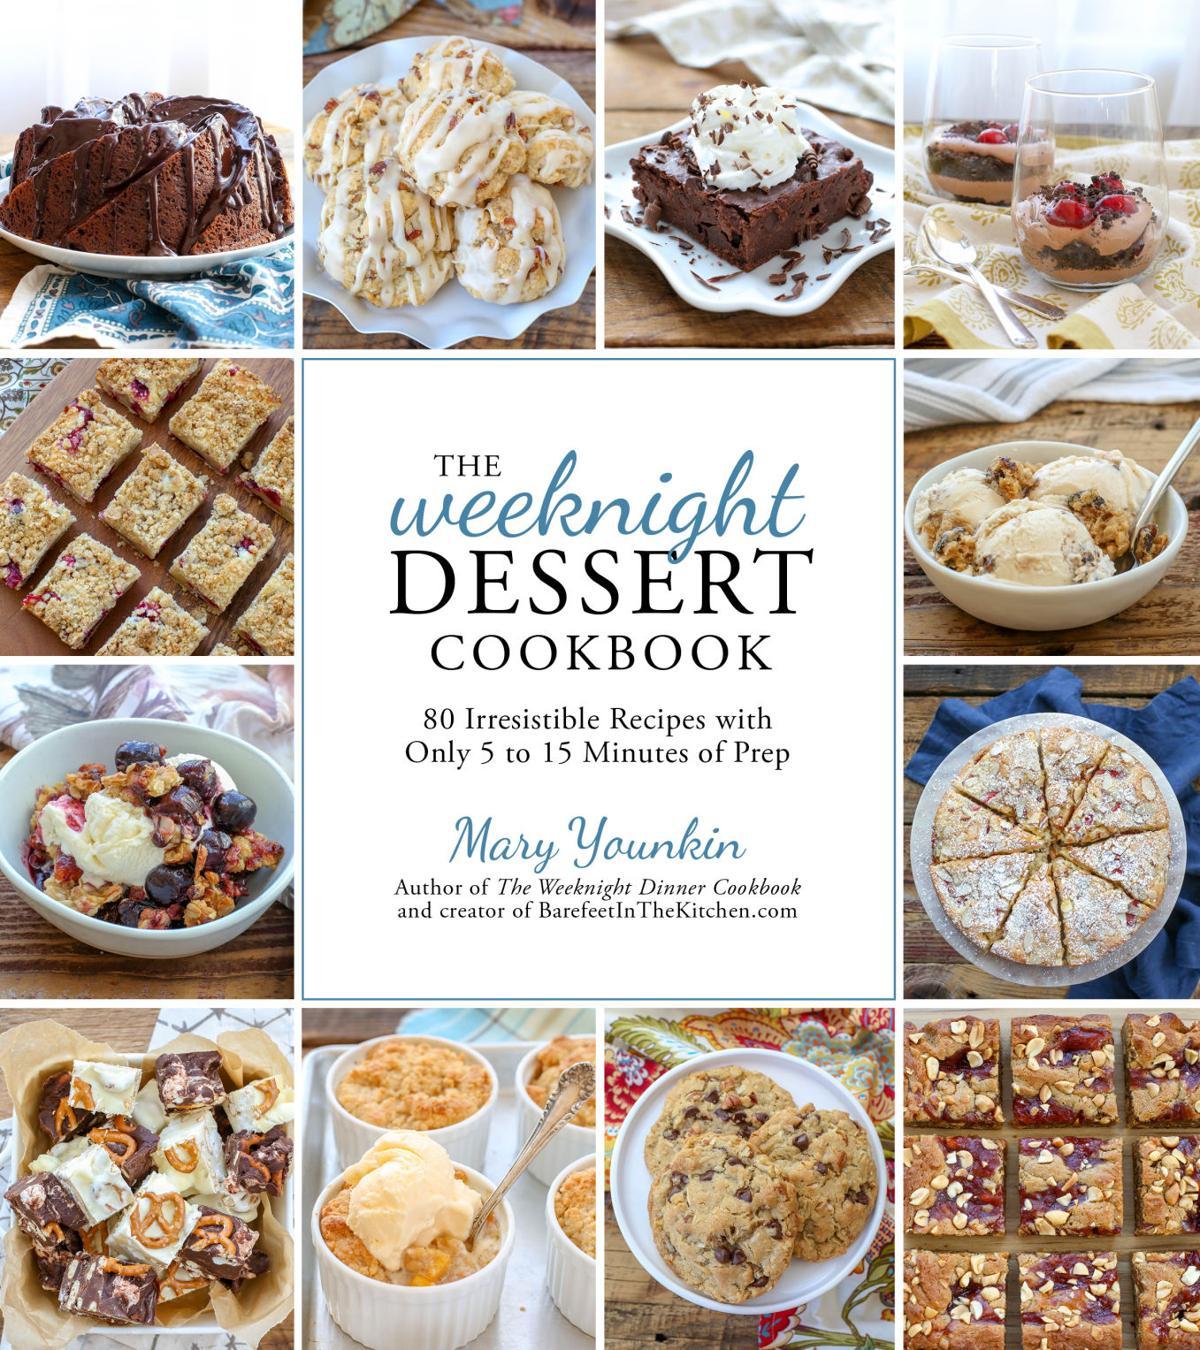 Dessert cookbook